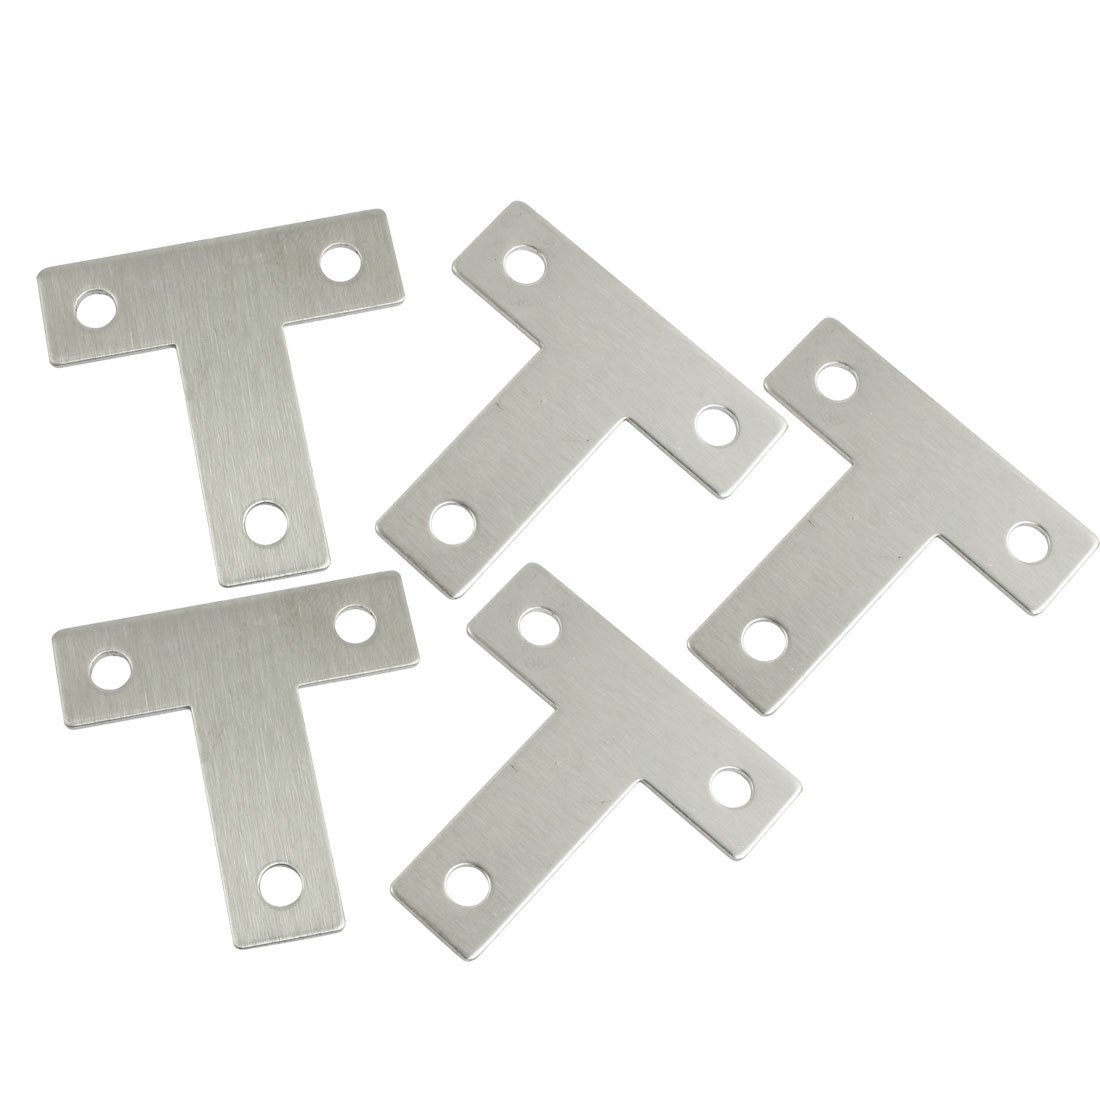 SODIAL(R) 5 Pcs Angle Plate Corner Brace Flat T Shape Repair Bracket 40mm x 40mm